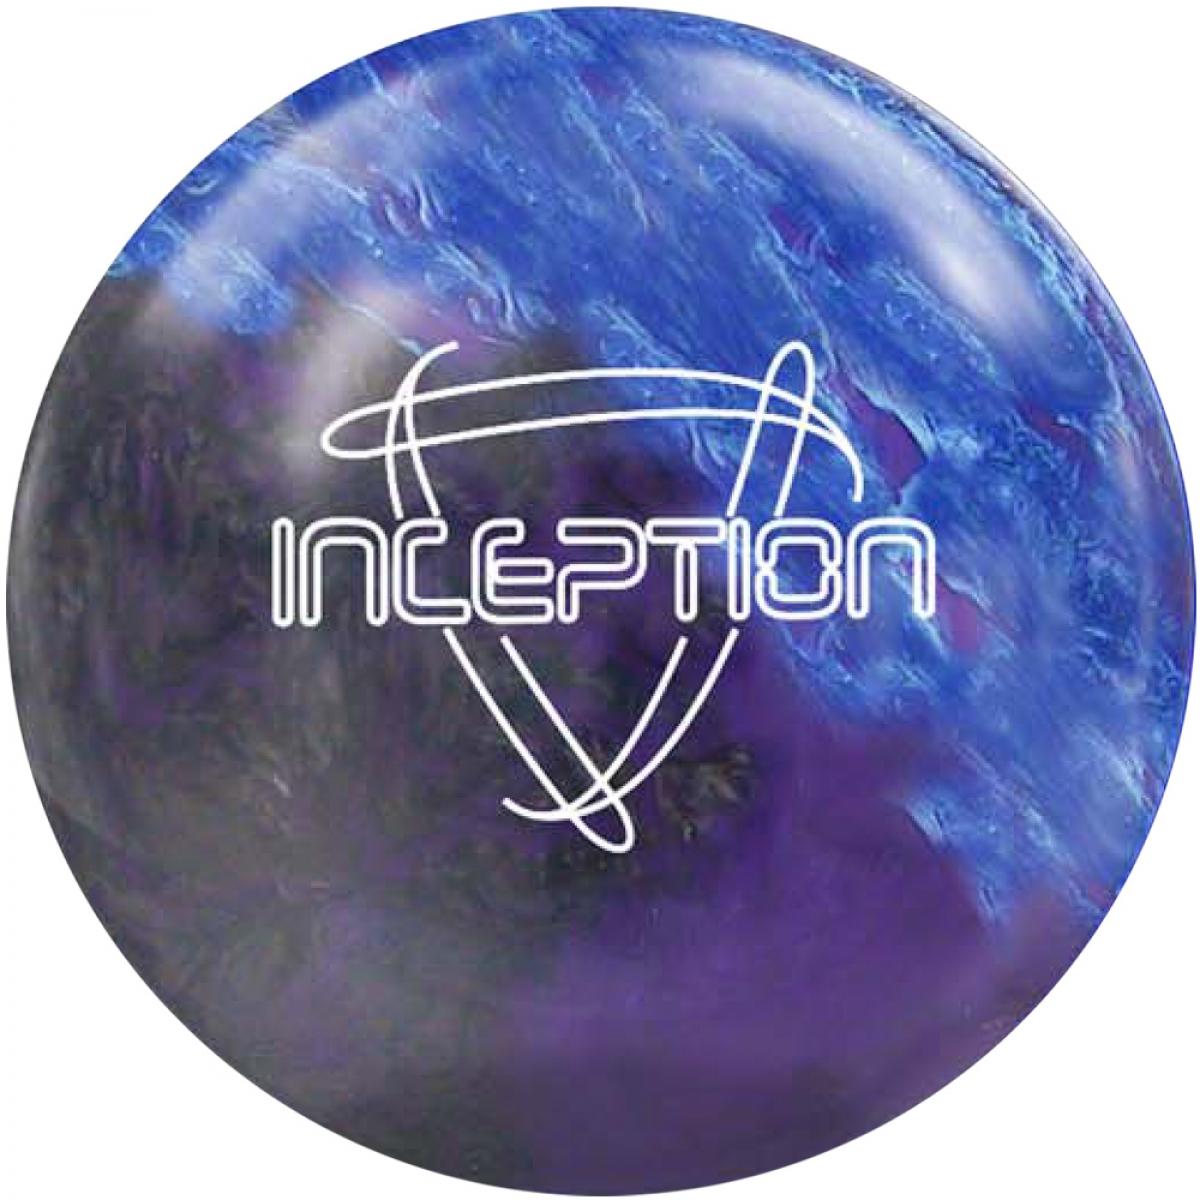 Reaktiv Bowling Ball Strike Ball Symetrischer Kern Roto Grip Idol